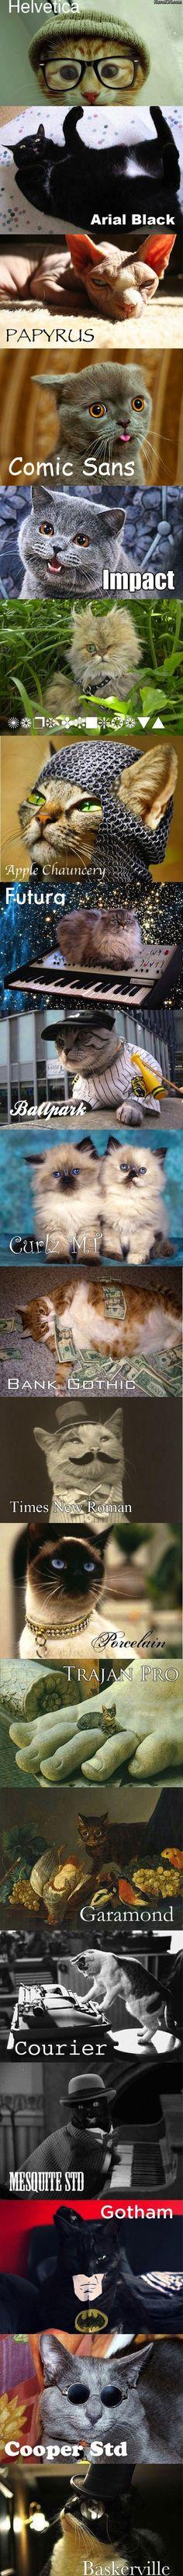 catfonts